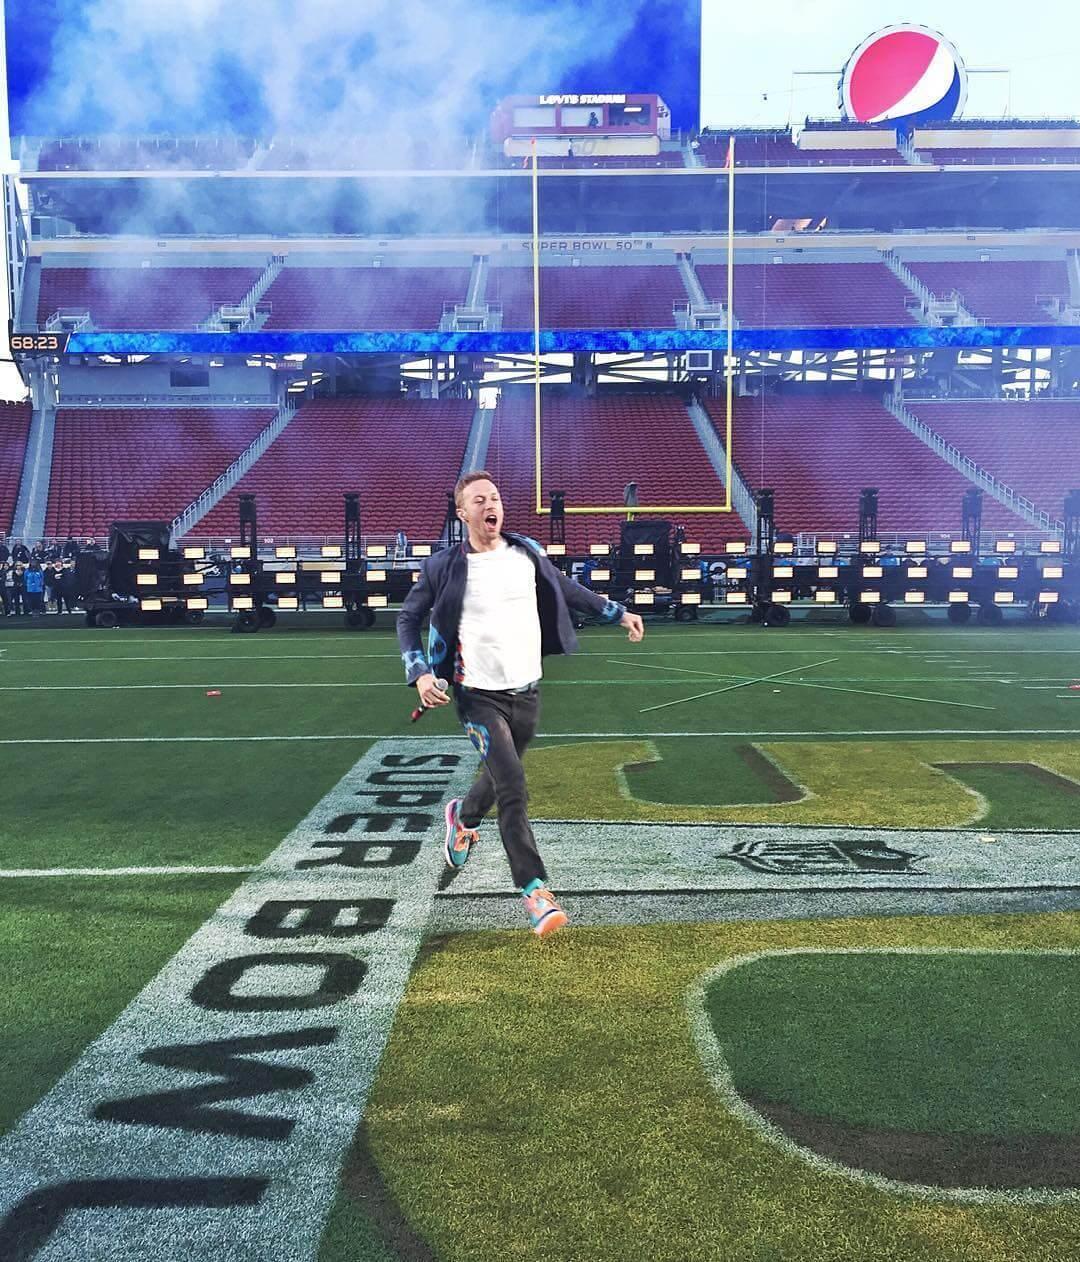 Twelve minutes more than 100 million viewers the Super Bowlhellip